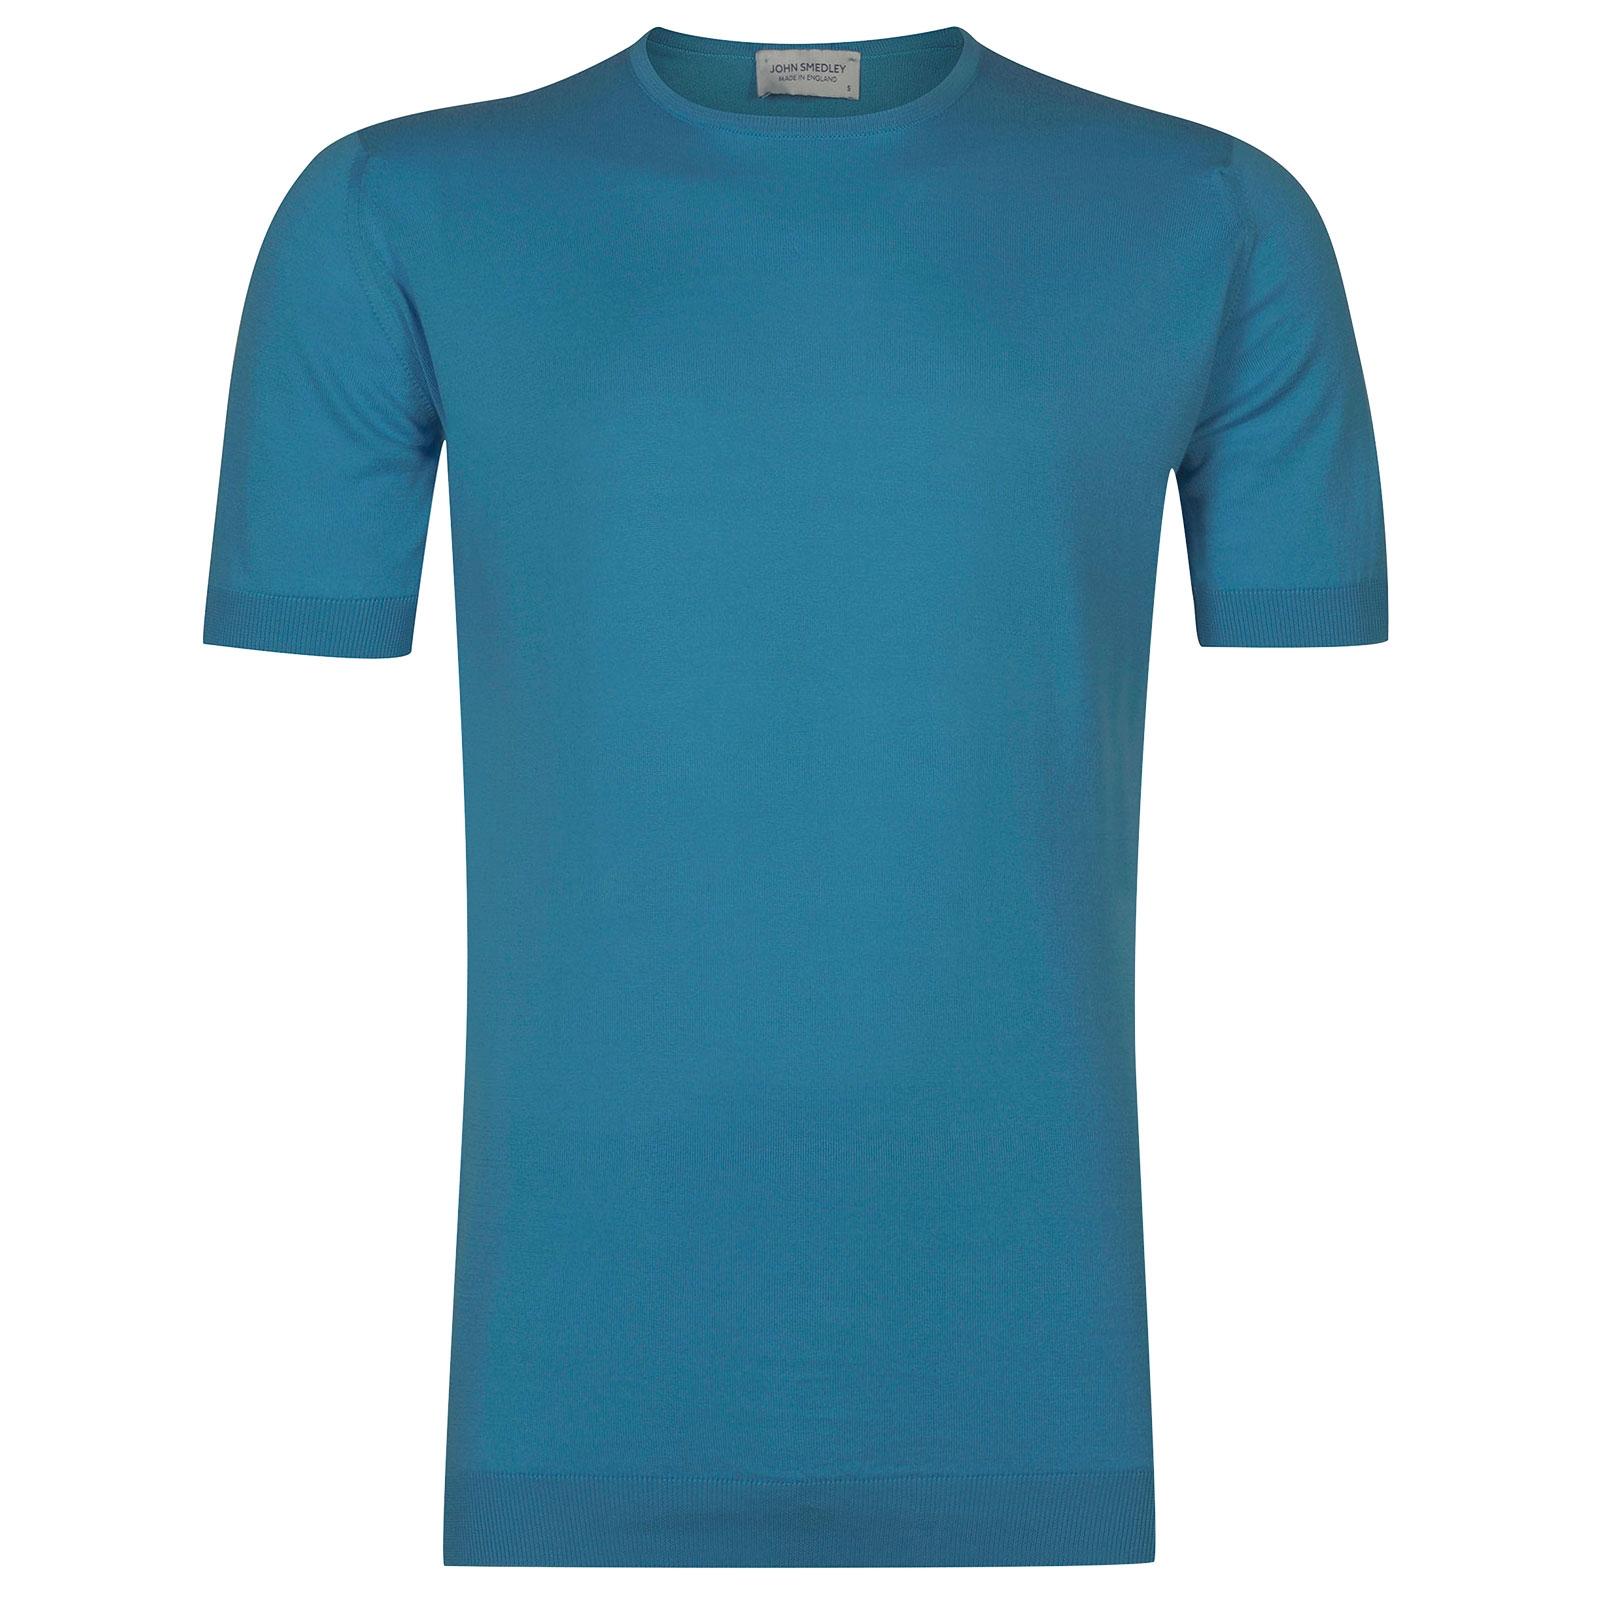 John Smedley Belden Sea Island Cotton T-shirt in Ionize Blue-XL